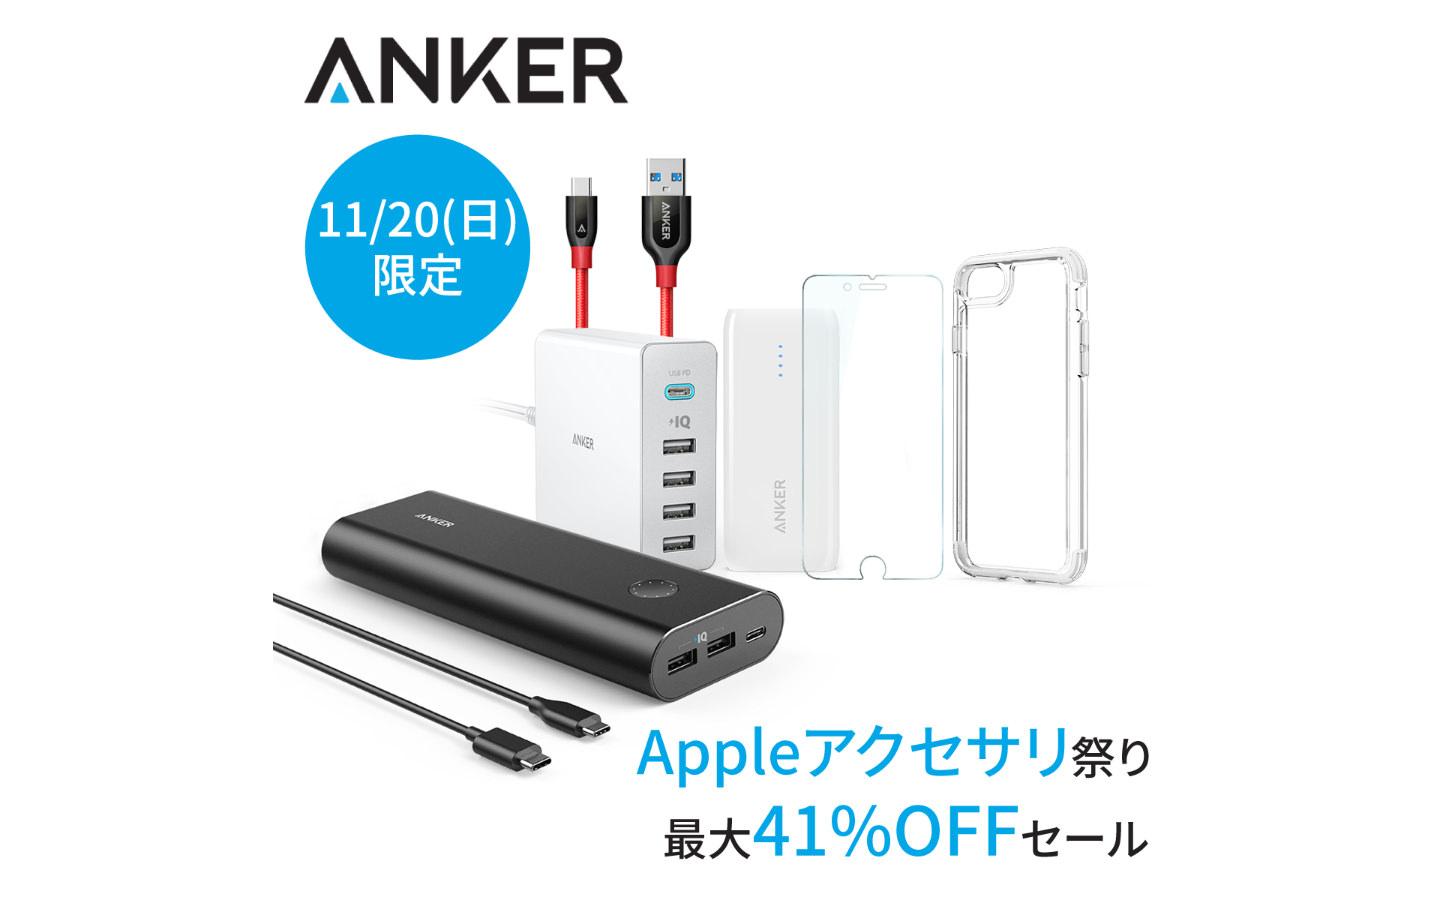 Anker 20161120 sale